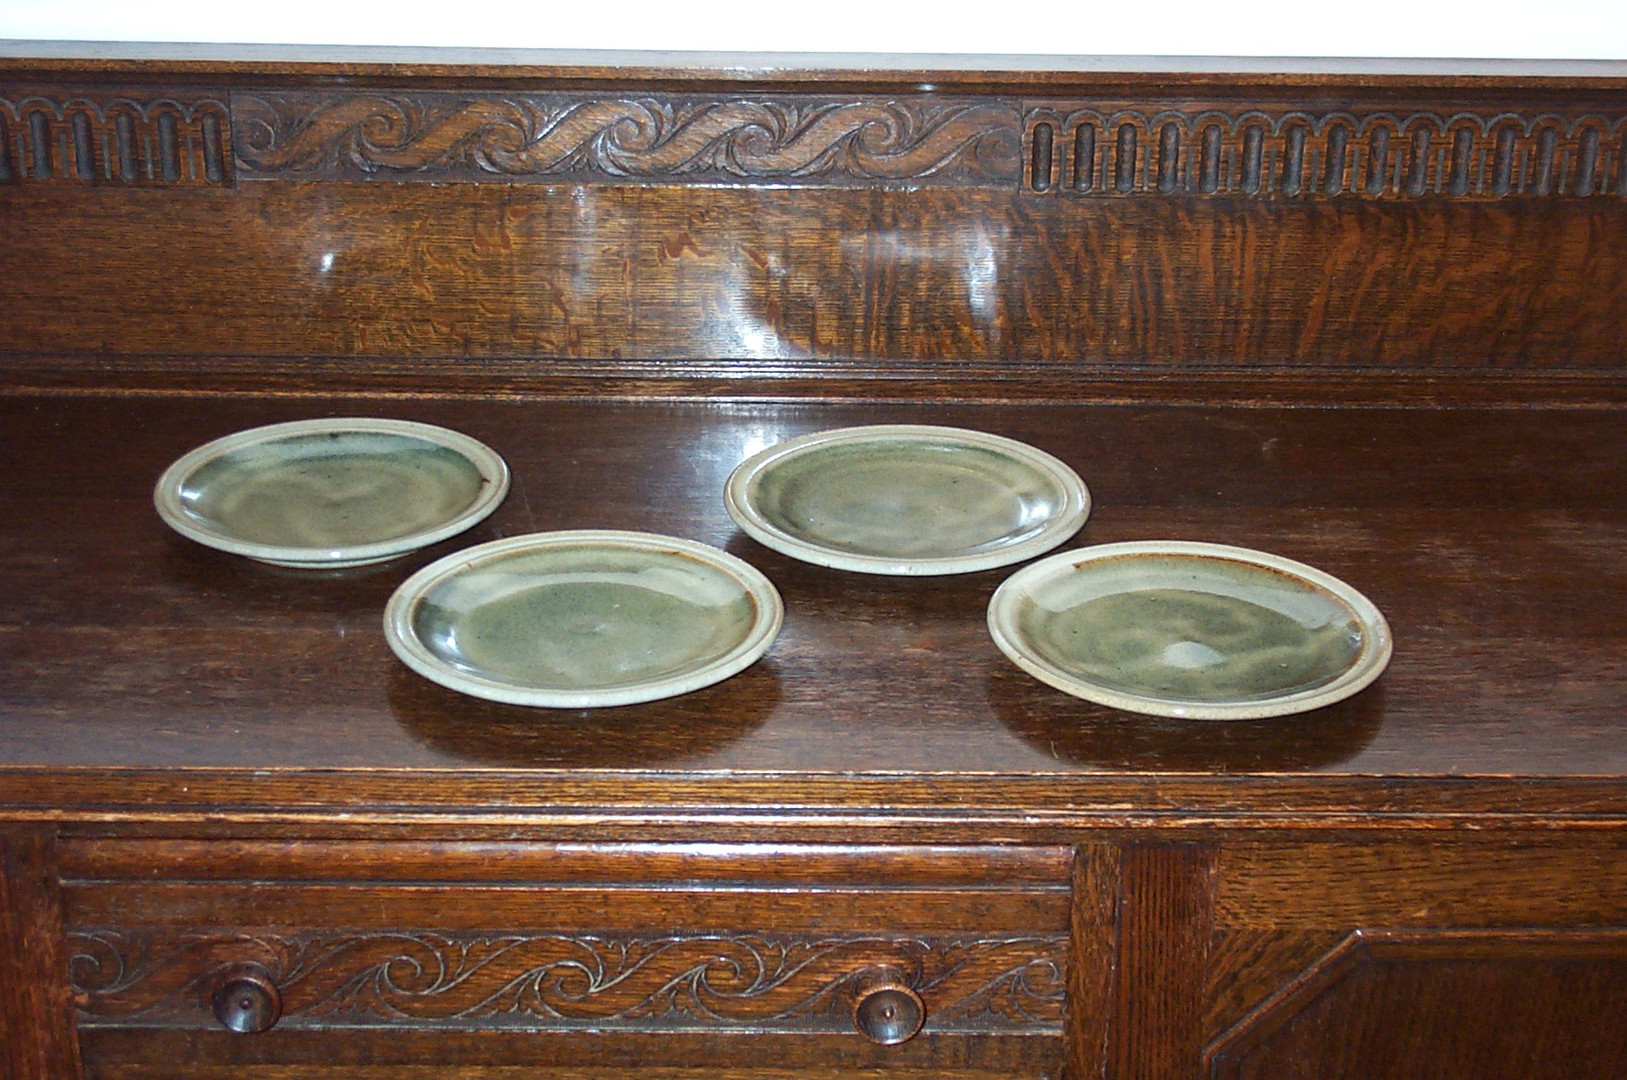 067-072  plates.jpg